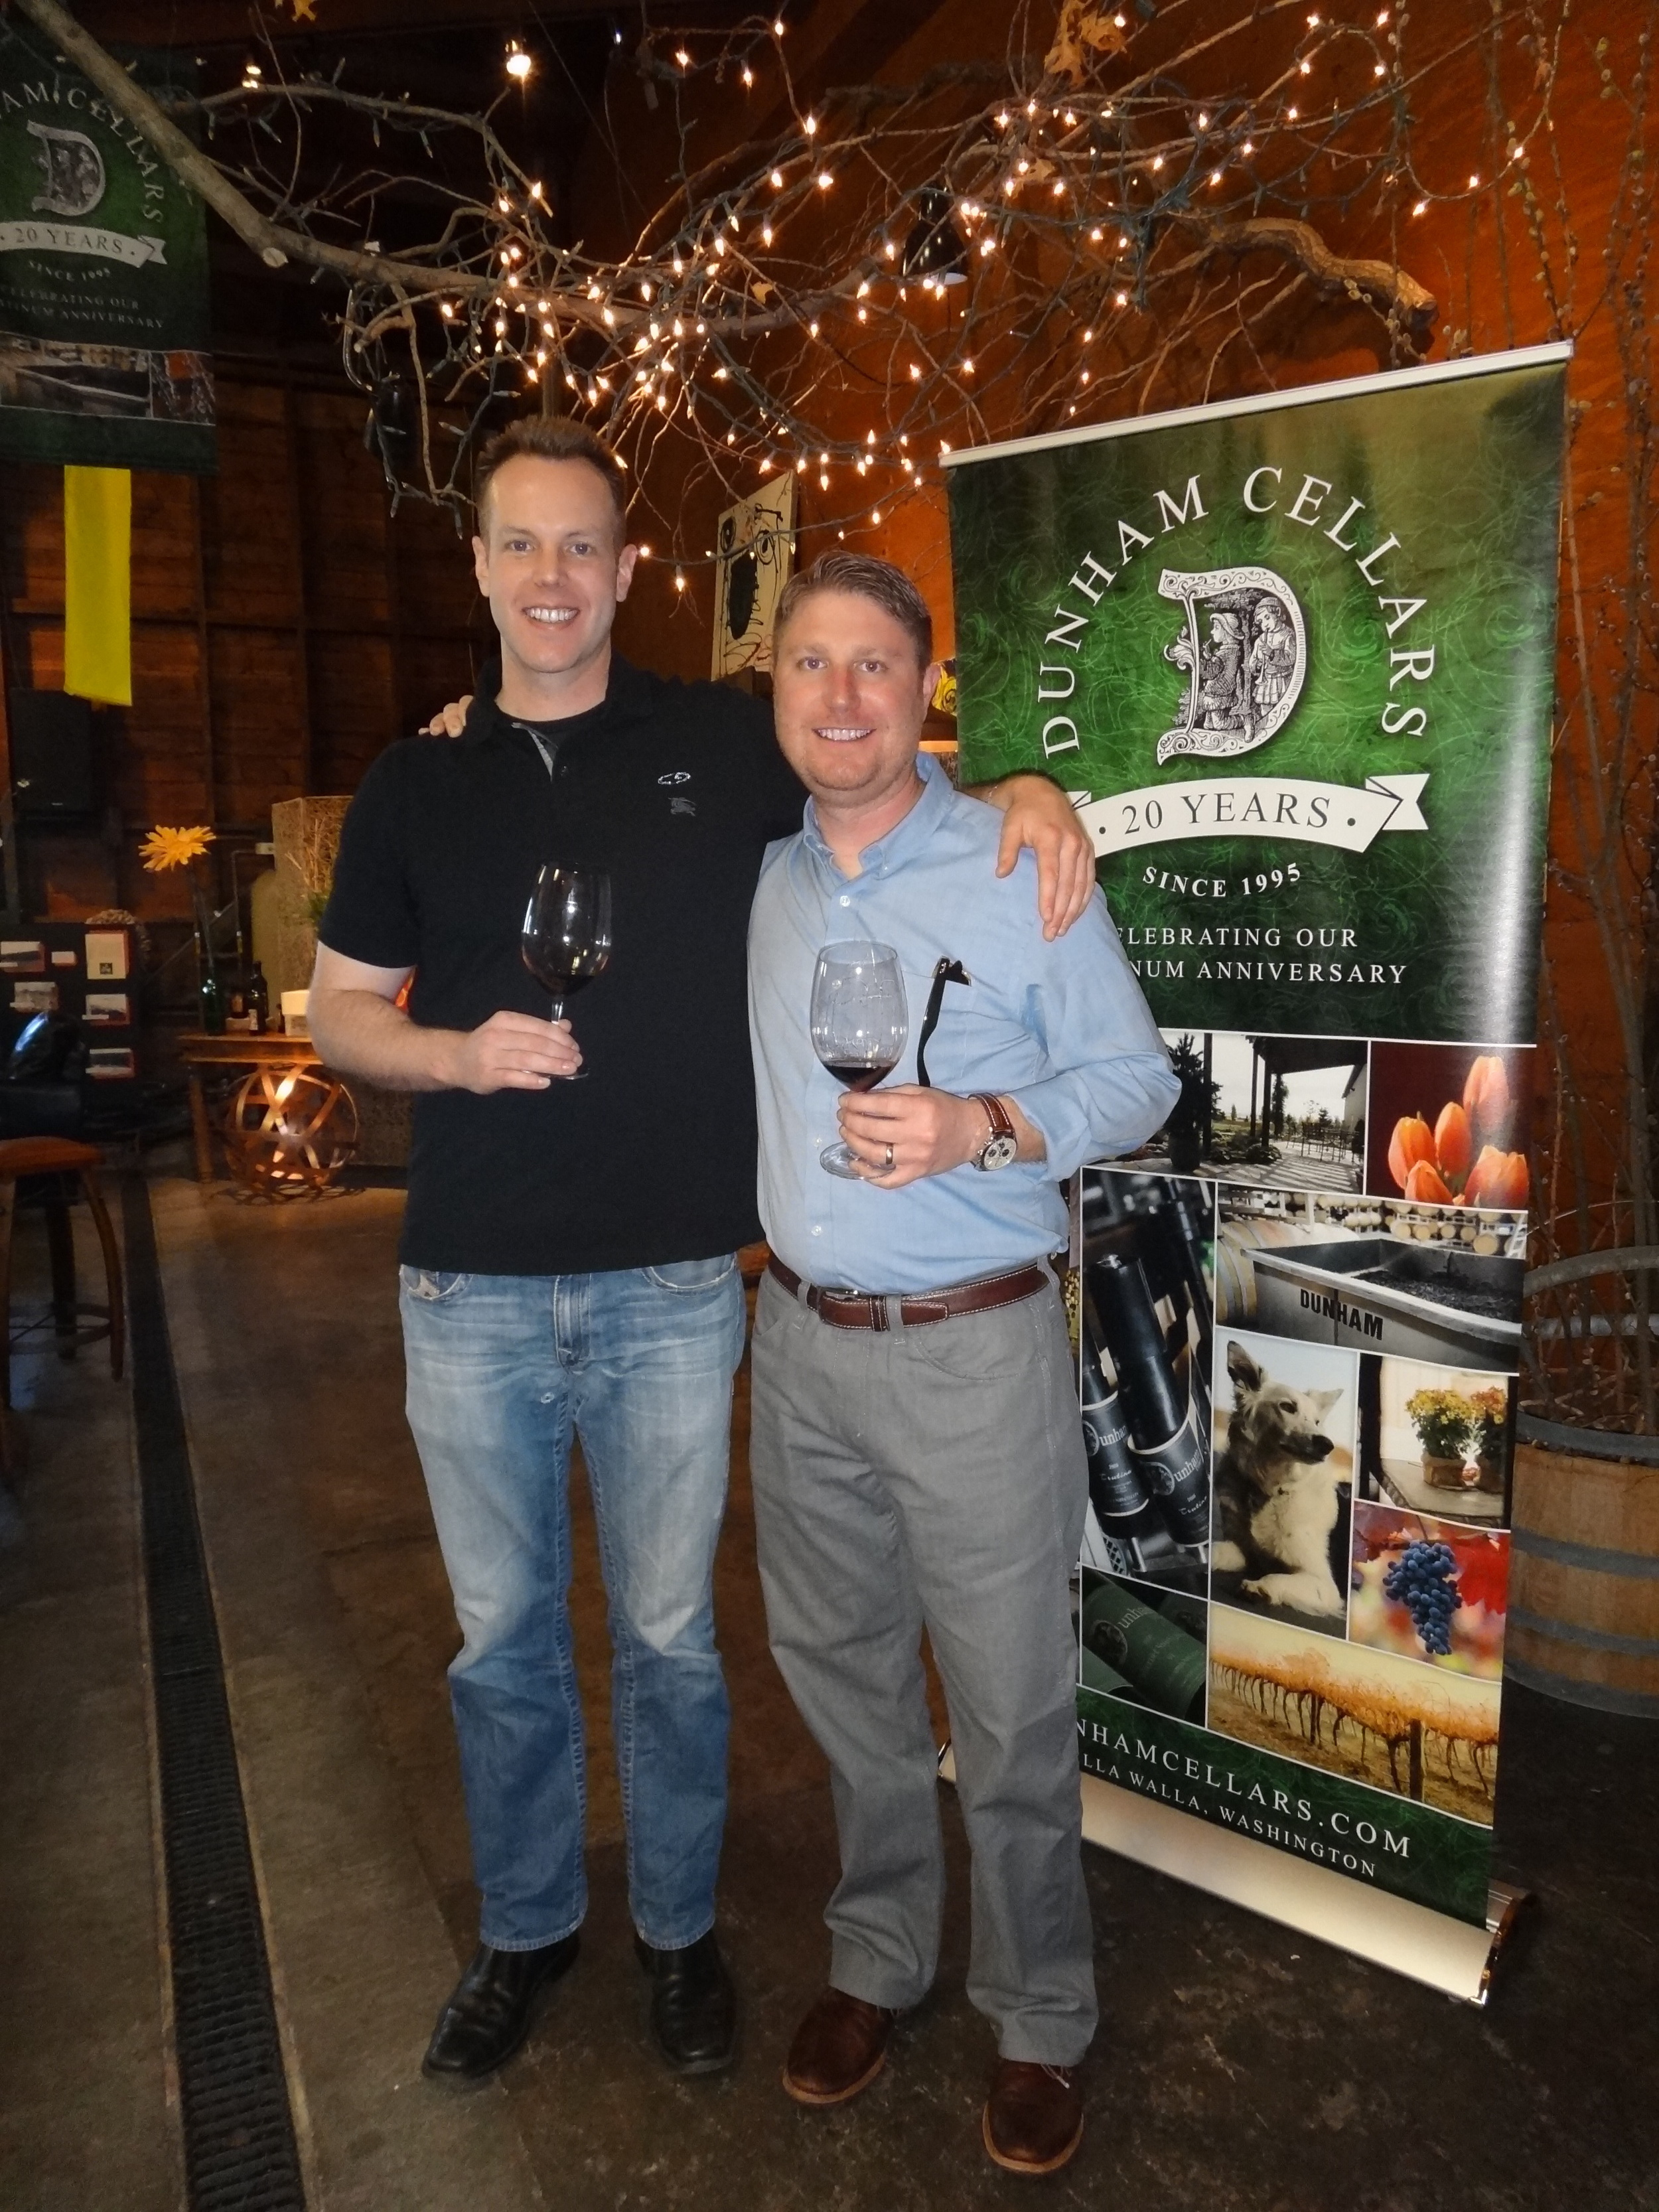 Tasting wine with Dan Wampfler